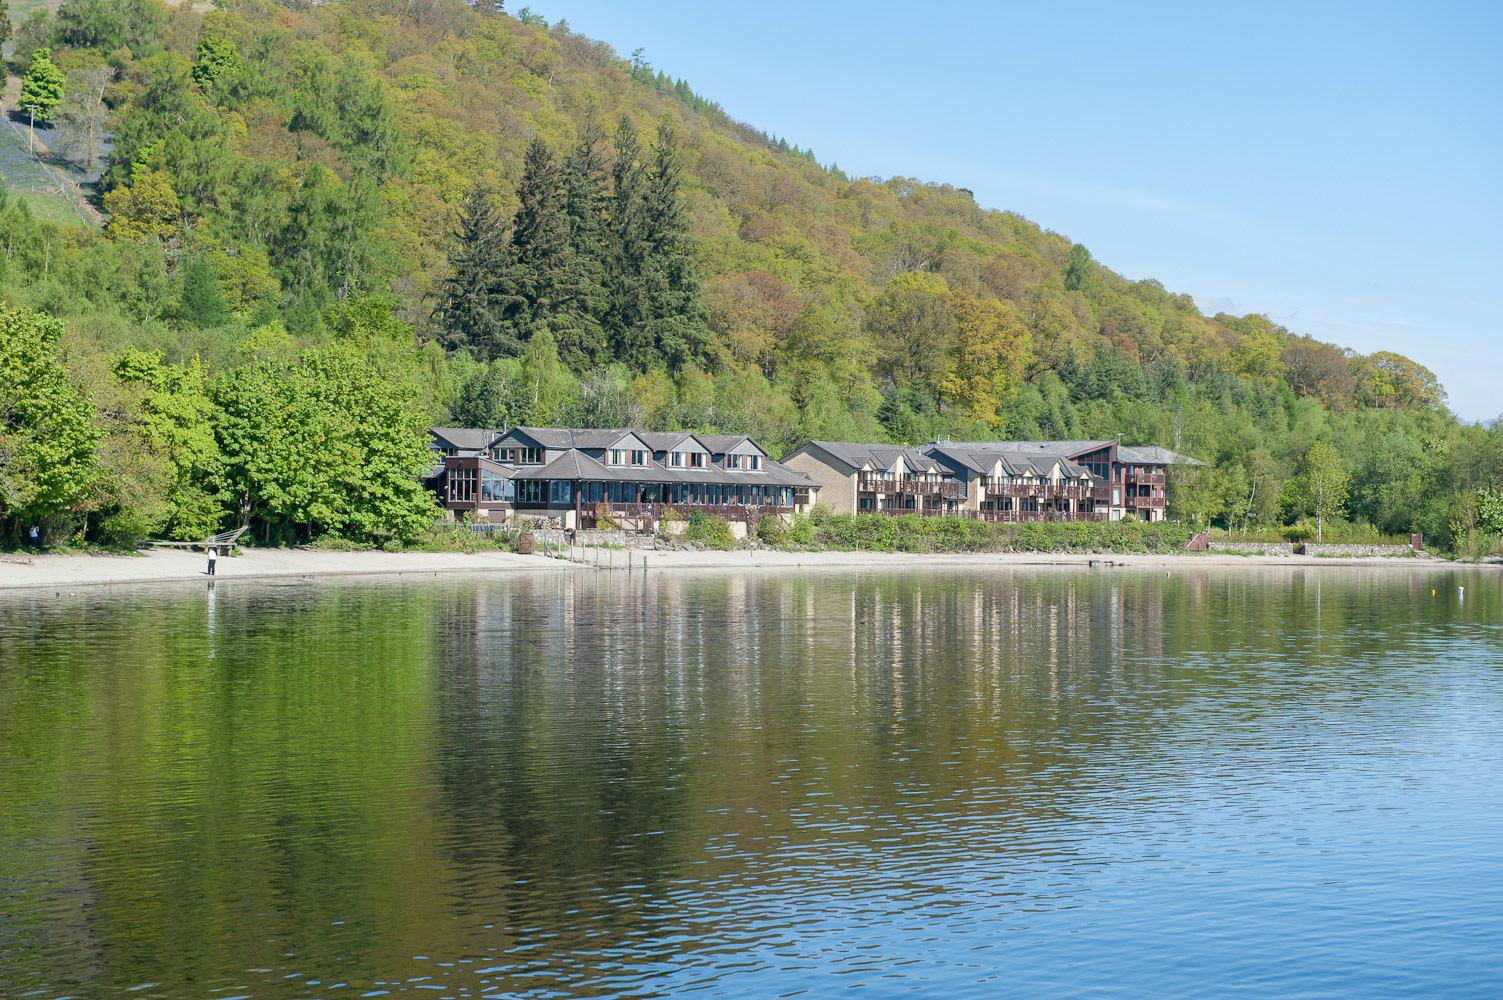 Lodge on Loch Lomond exterior